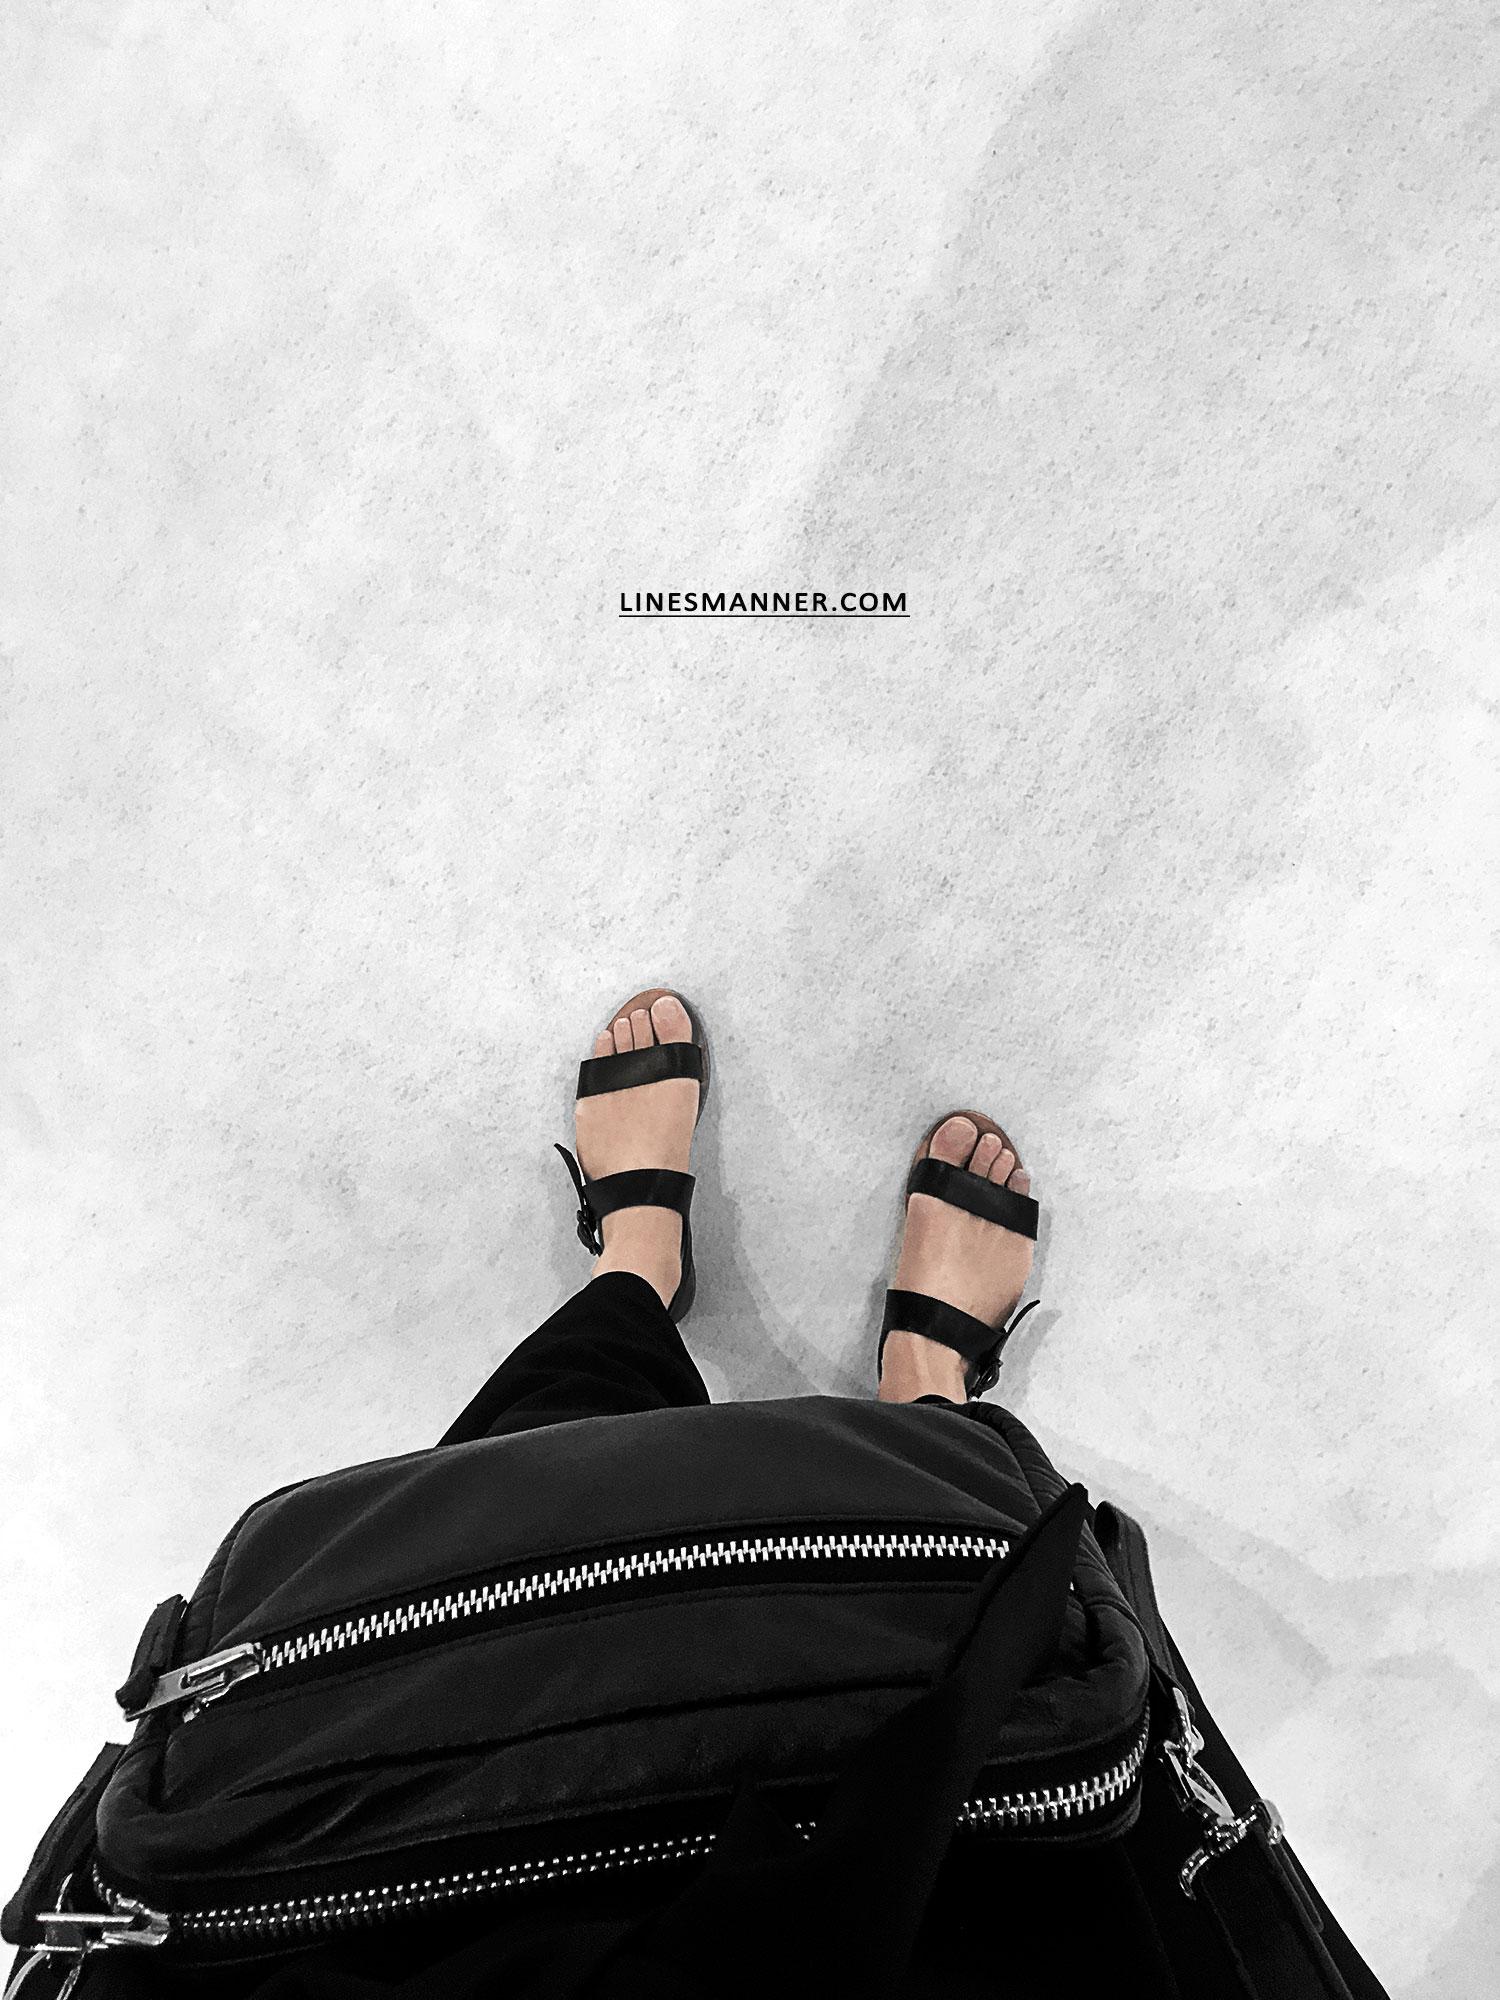 Lines-Manner-Who's_Next-Fashion-International-Show-Paris-Designers-Collection-Creators-Emerging_Designers-Independant-Eco_Fashion-Sustainable-Monochrome-Details-3